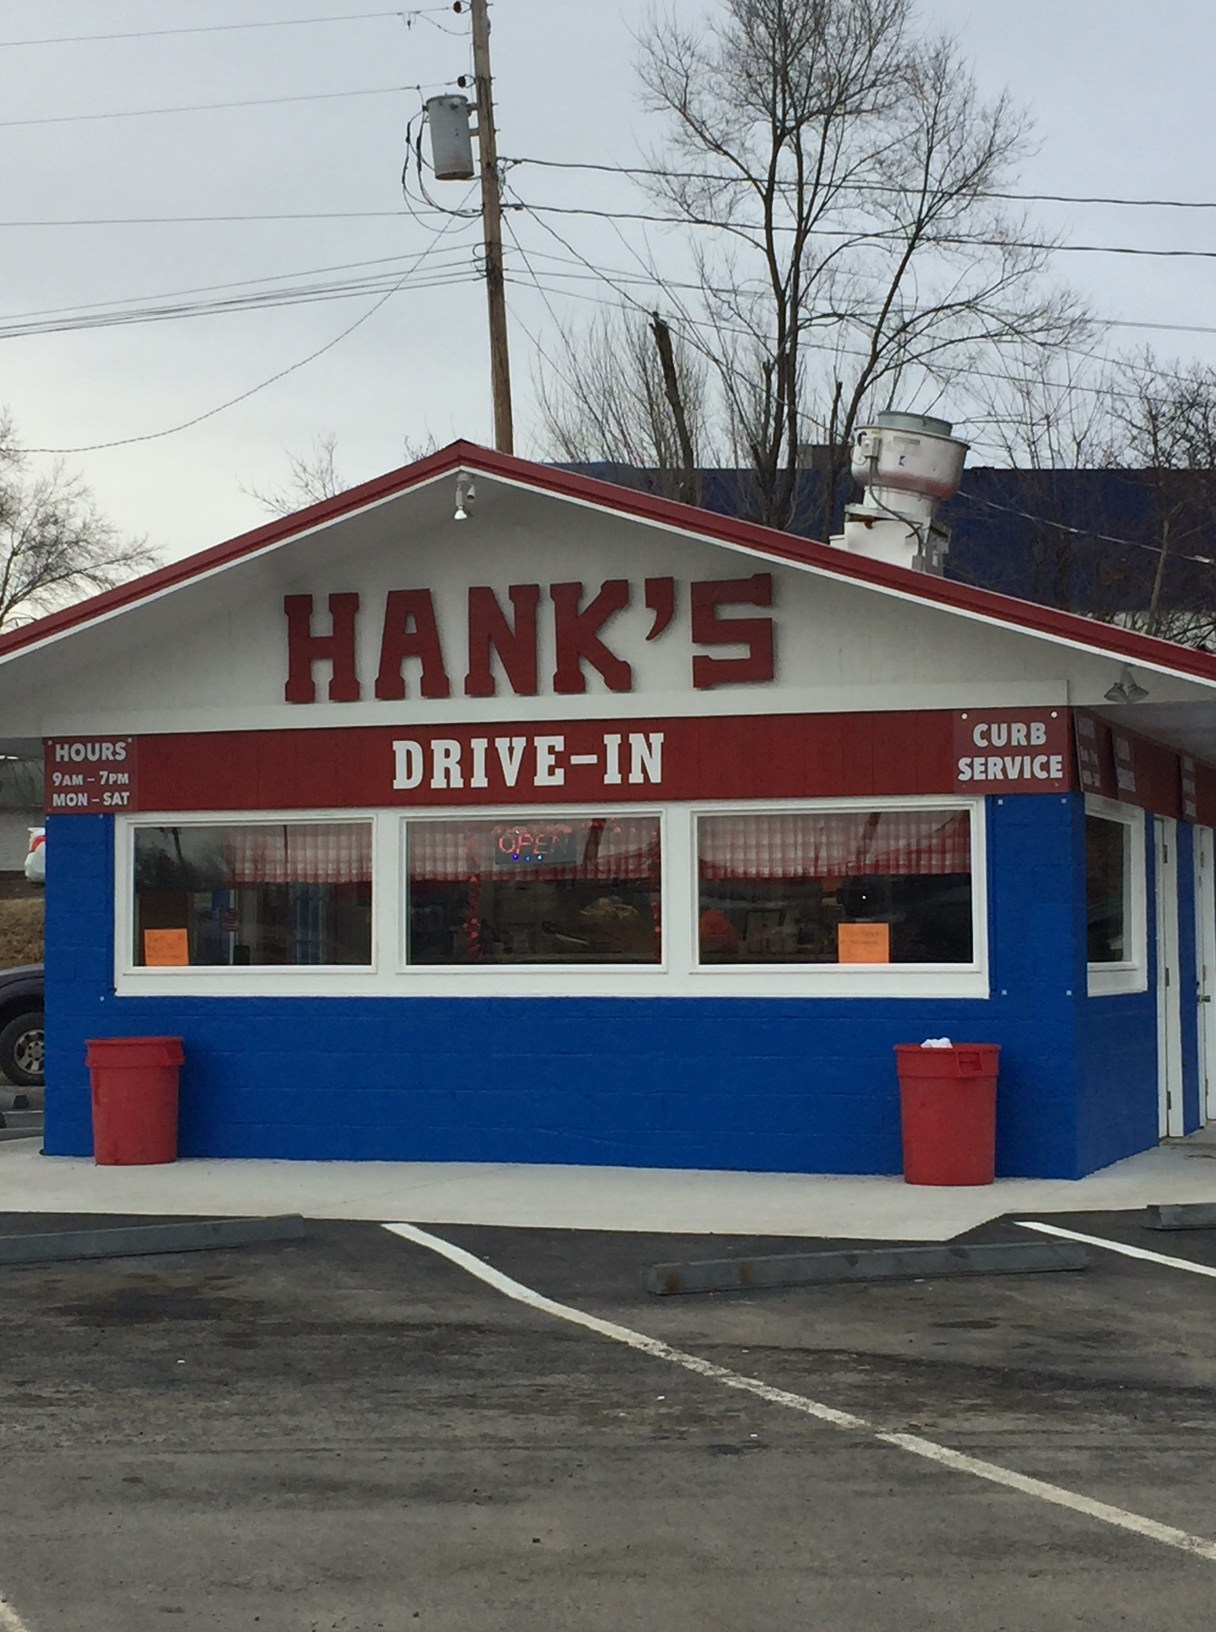 Hanks Drive-in Fairlawn